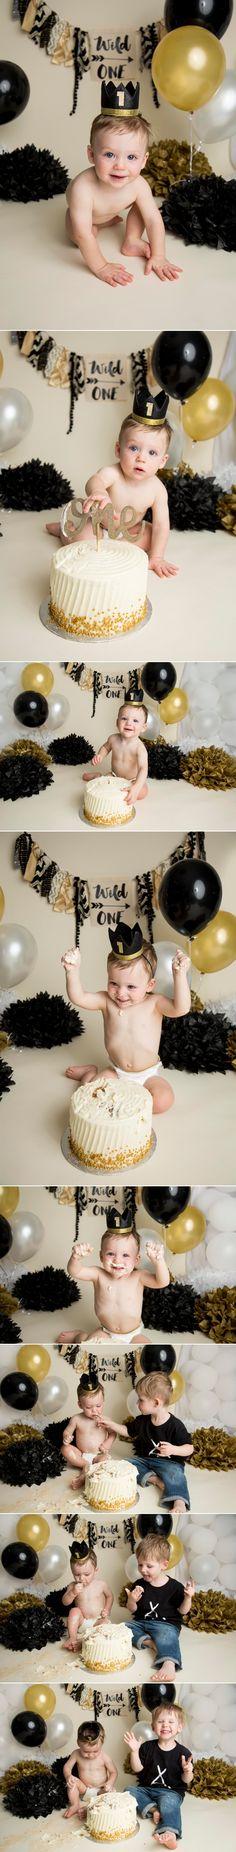 Wild One Gold Black and White Cake Smash  Regina Photographer